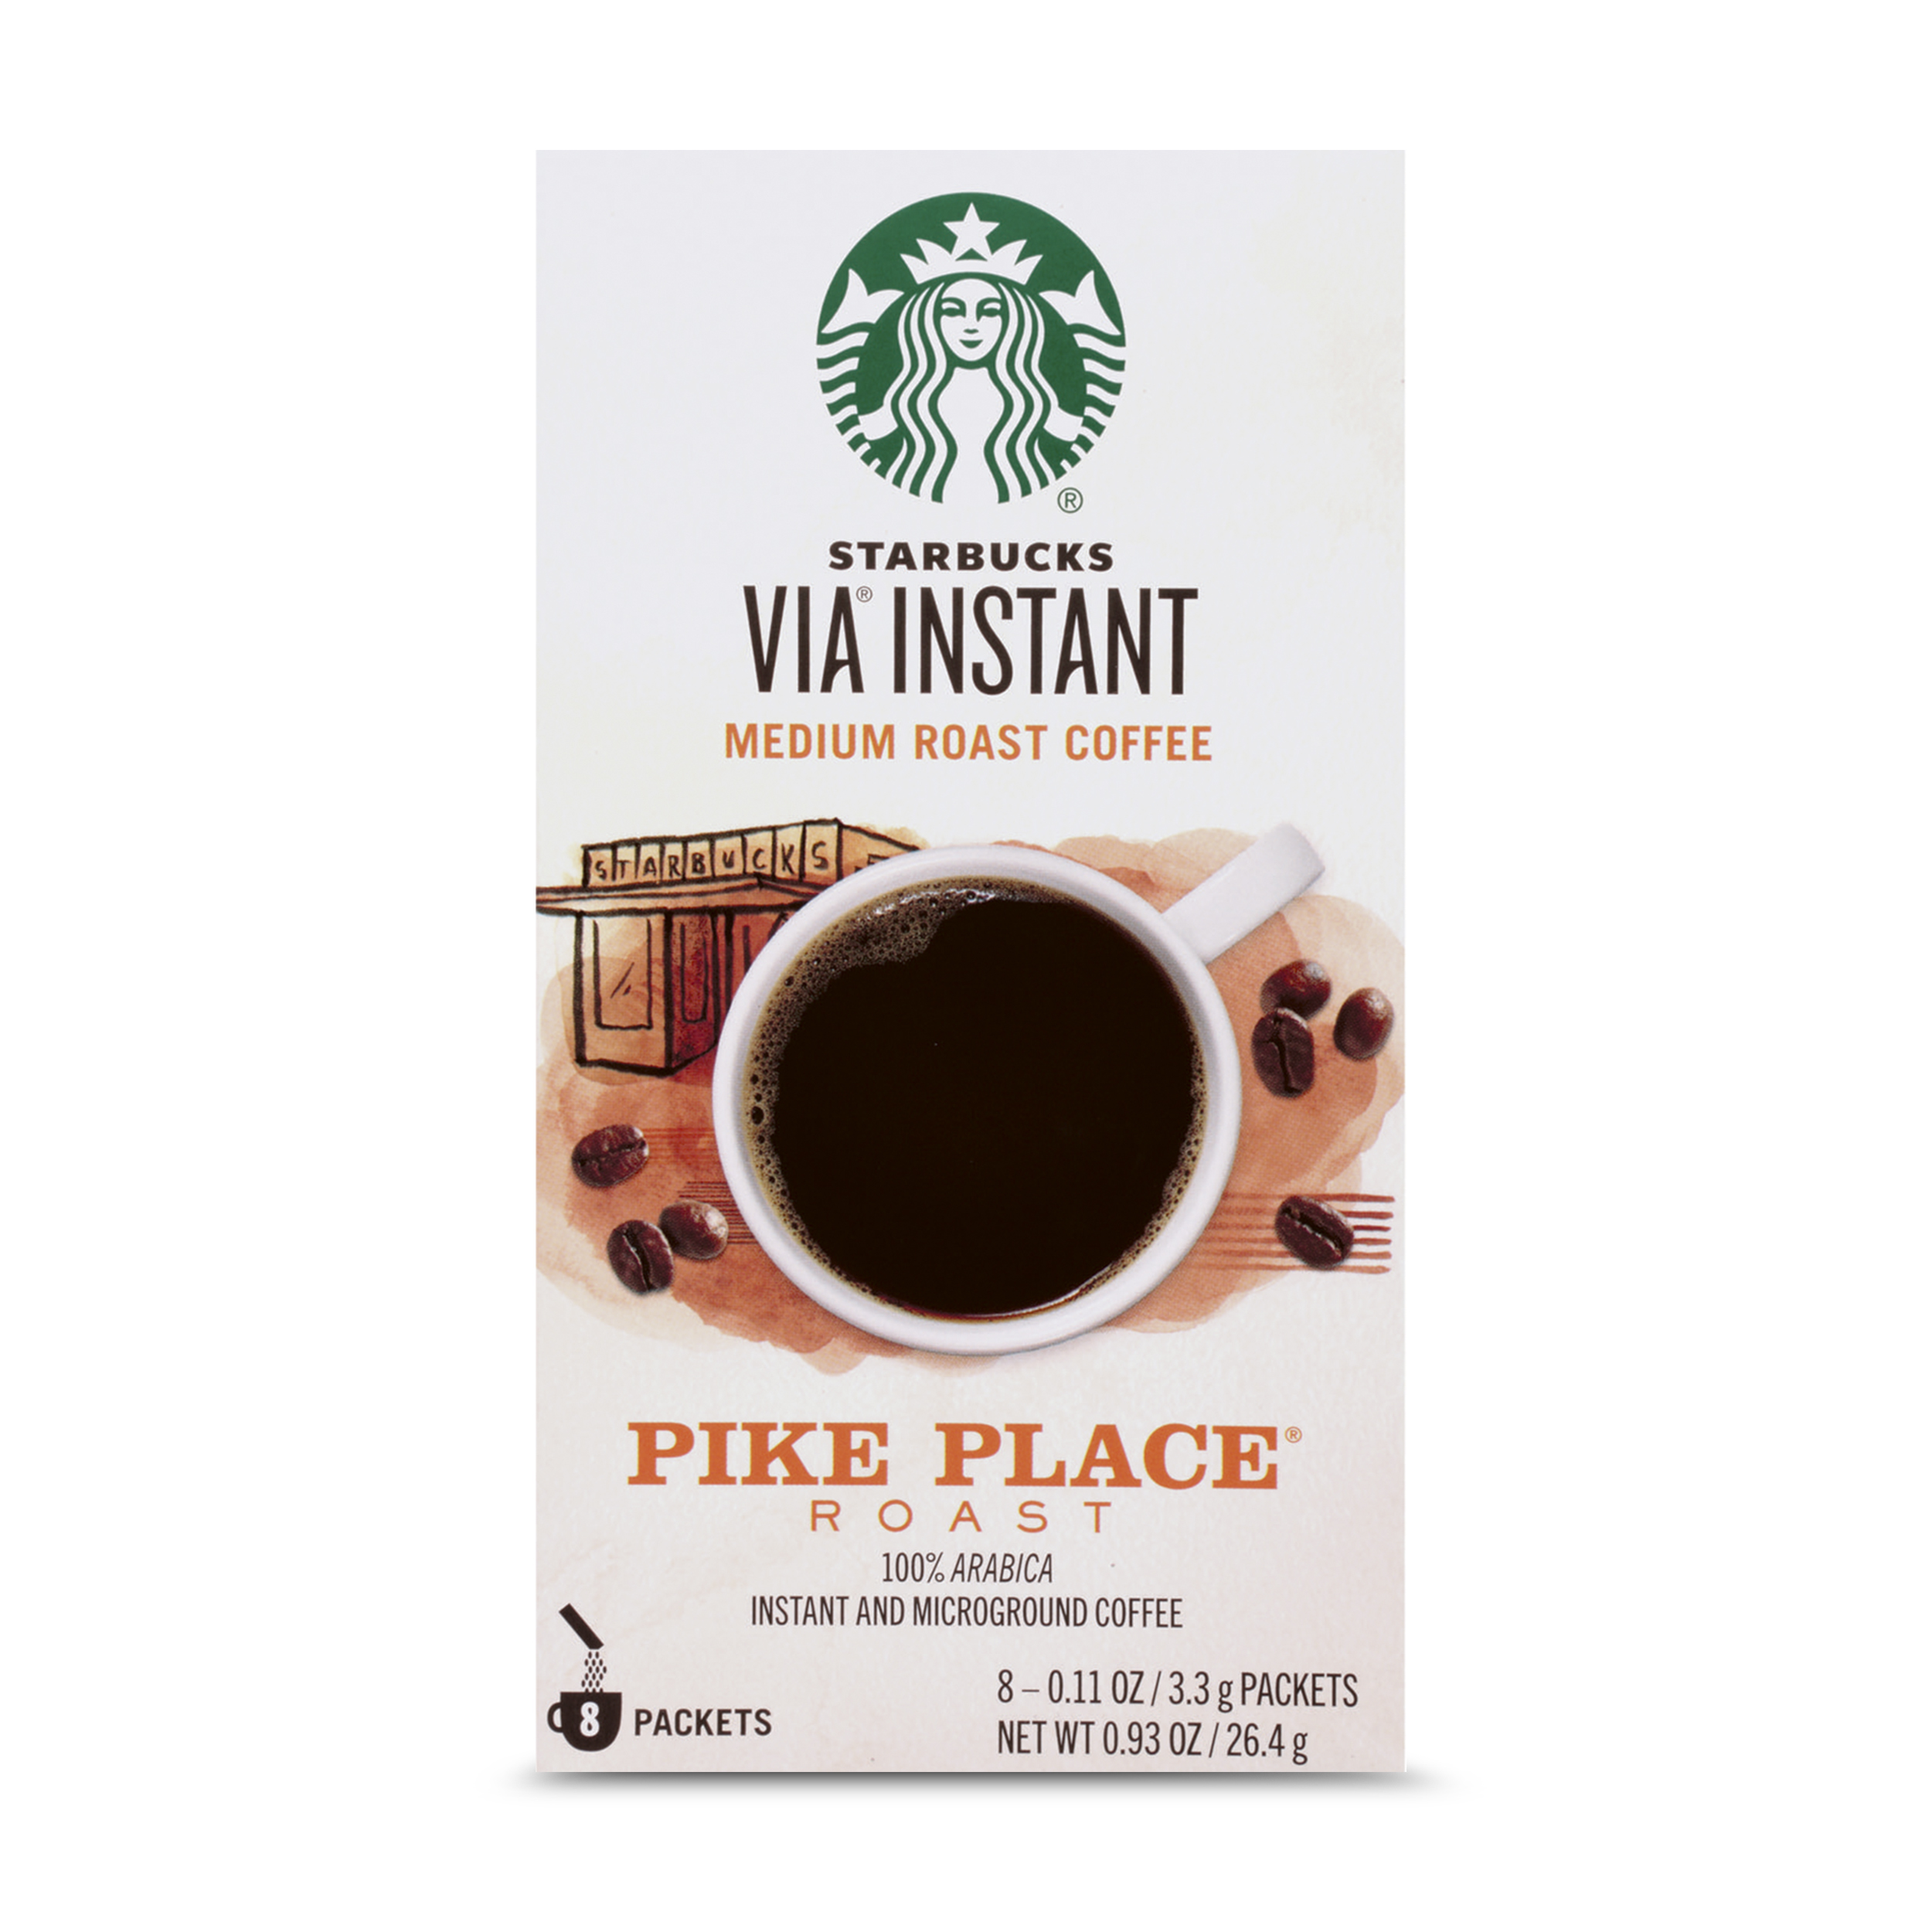 Starbucks VIA Instant Pike Place Roast Medium Roast Coffee (1 box of 8 packets)